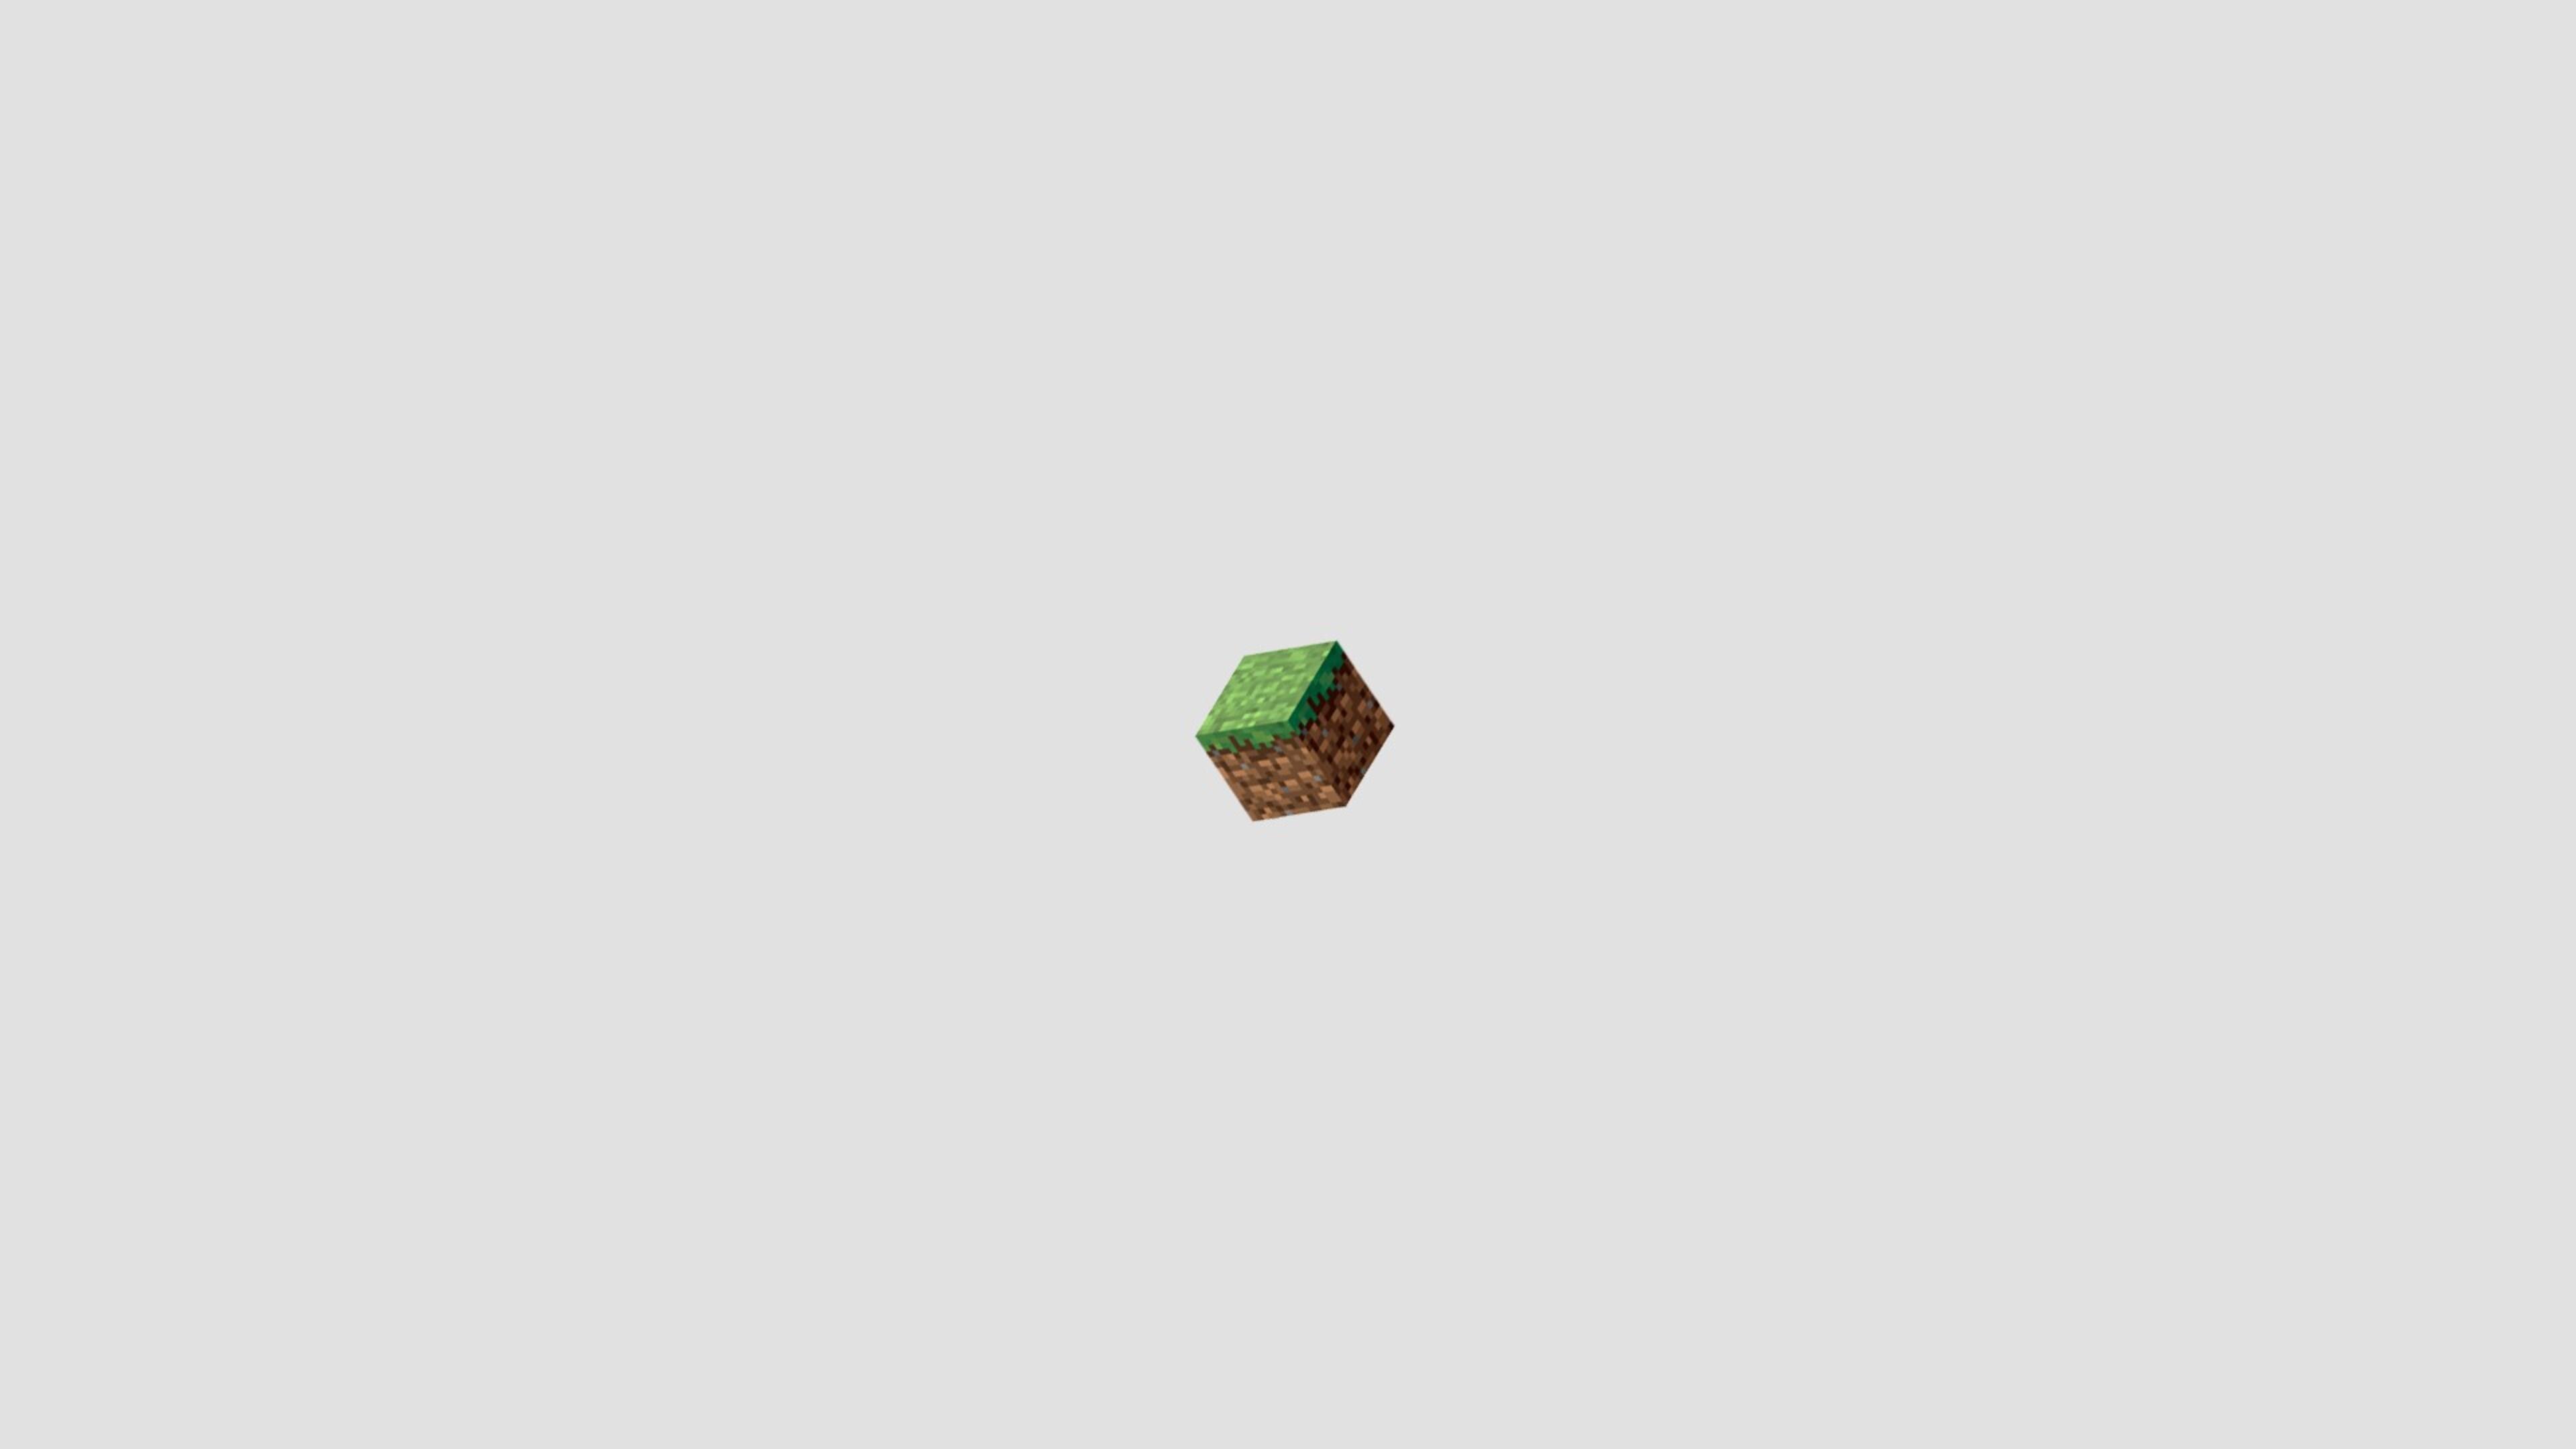 3840x2160 Minecraft Minimalism 4k Hd 4k Wallpapers Images